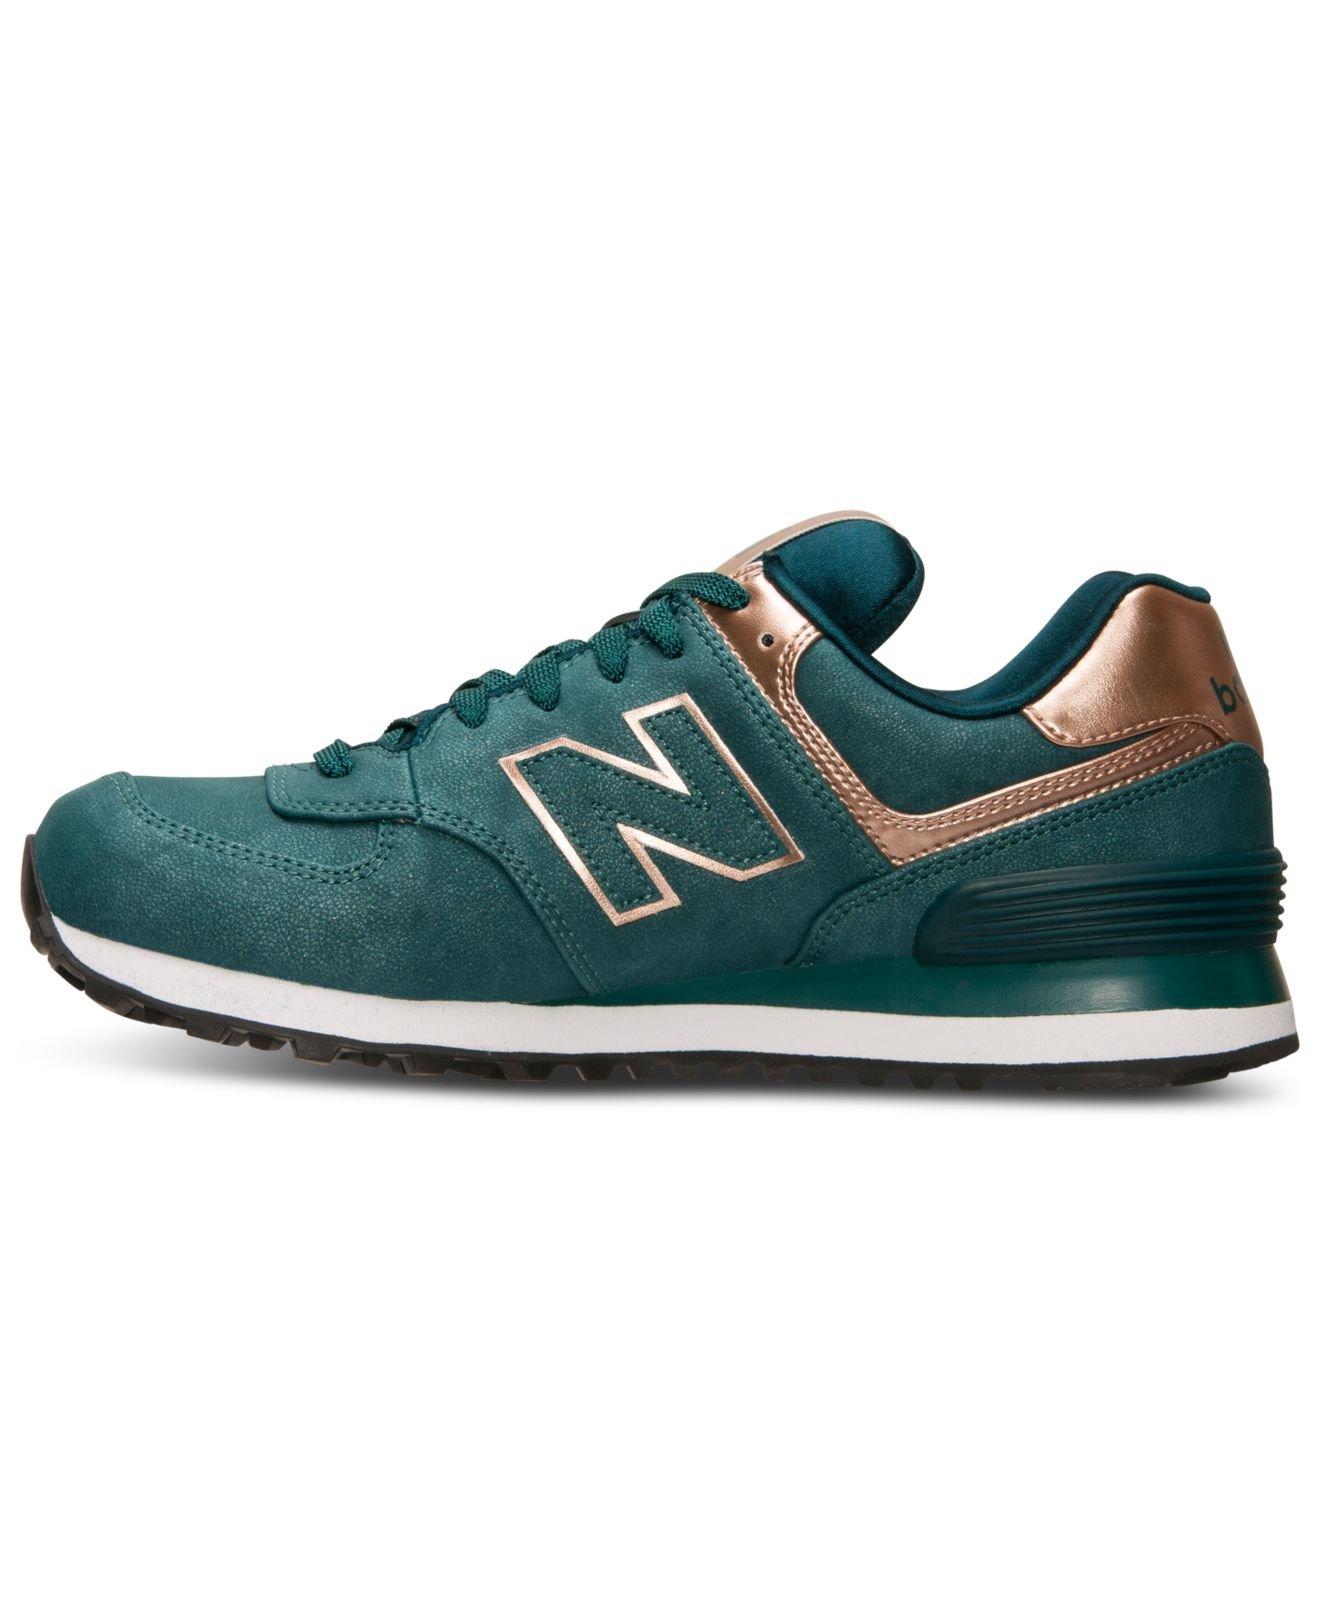 Hunter Green Tennis Shoes